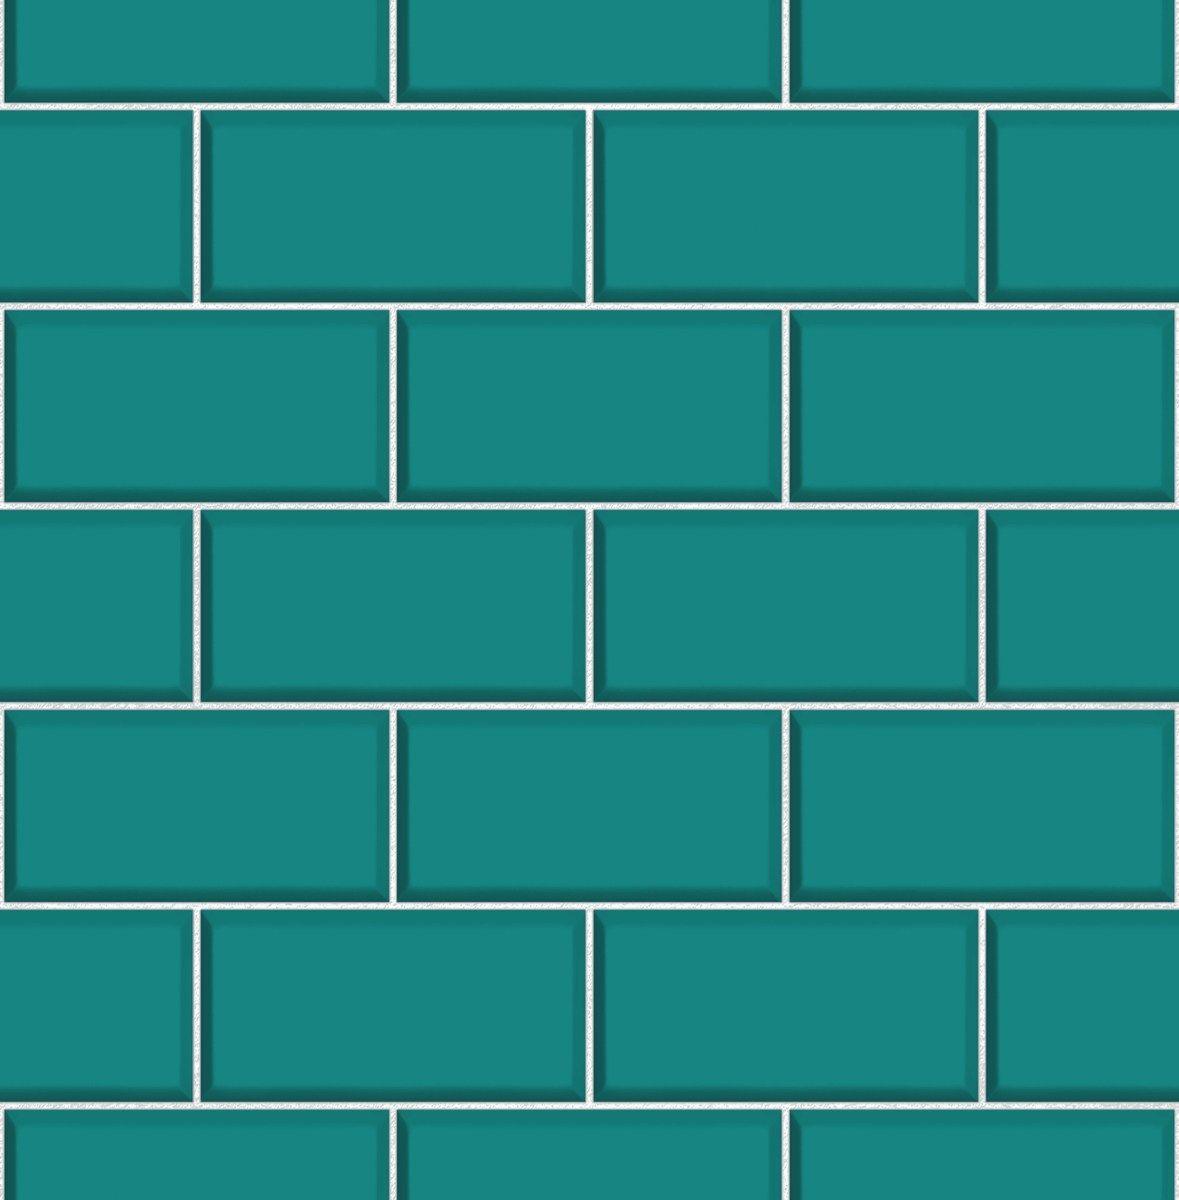 Ceramica Teal Subway Tile Effect Wallpaper by Fine Decor FD40139 ...